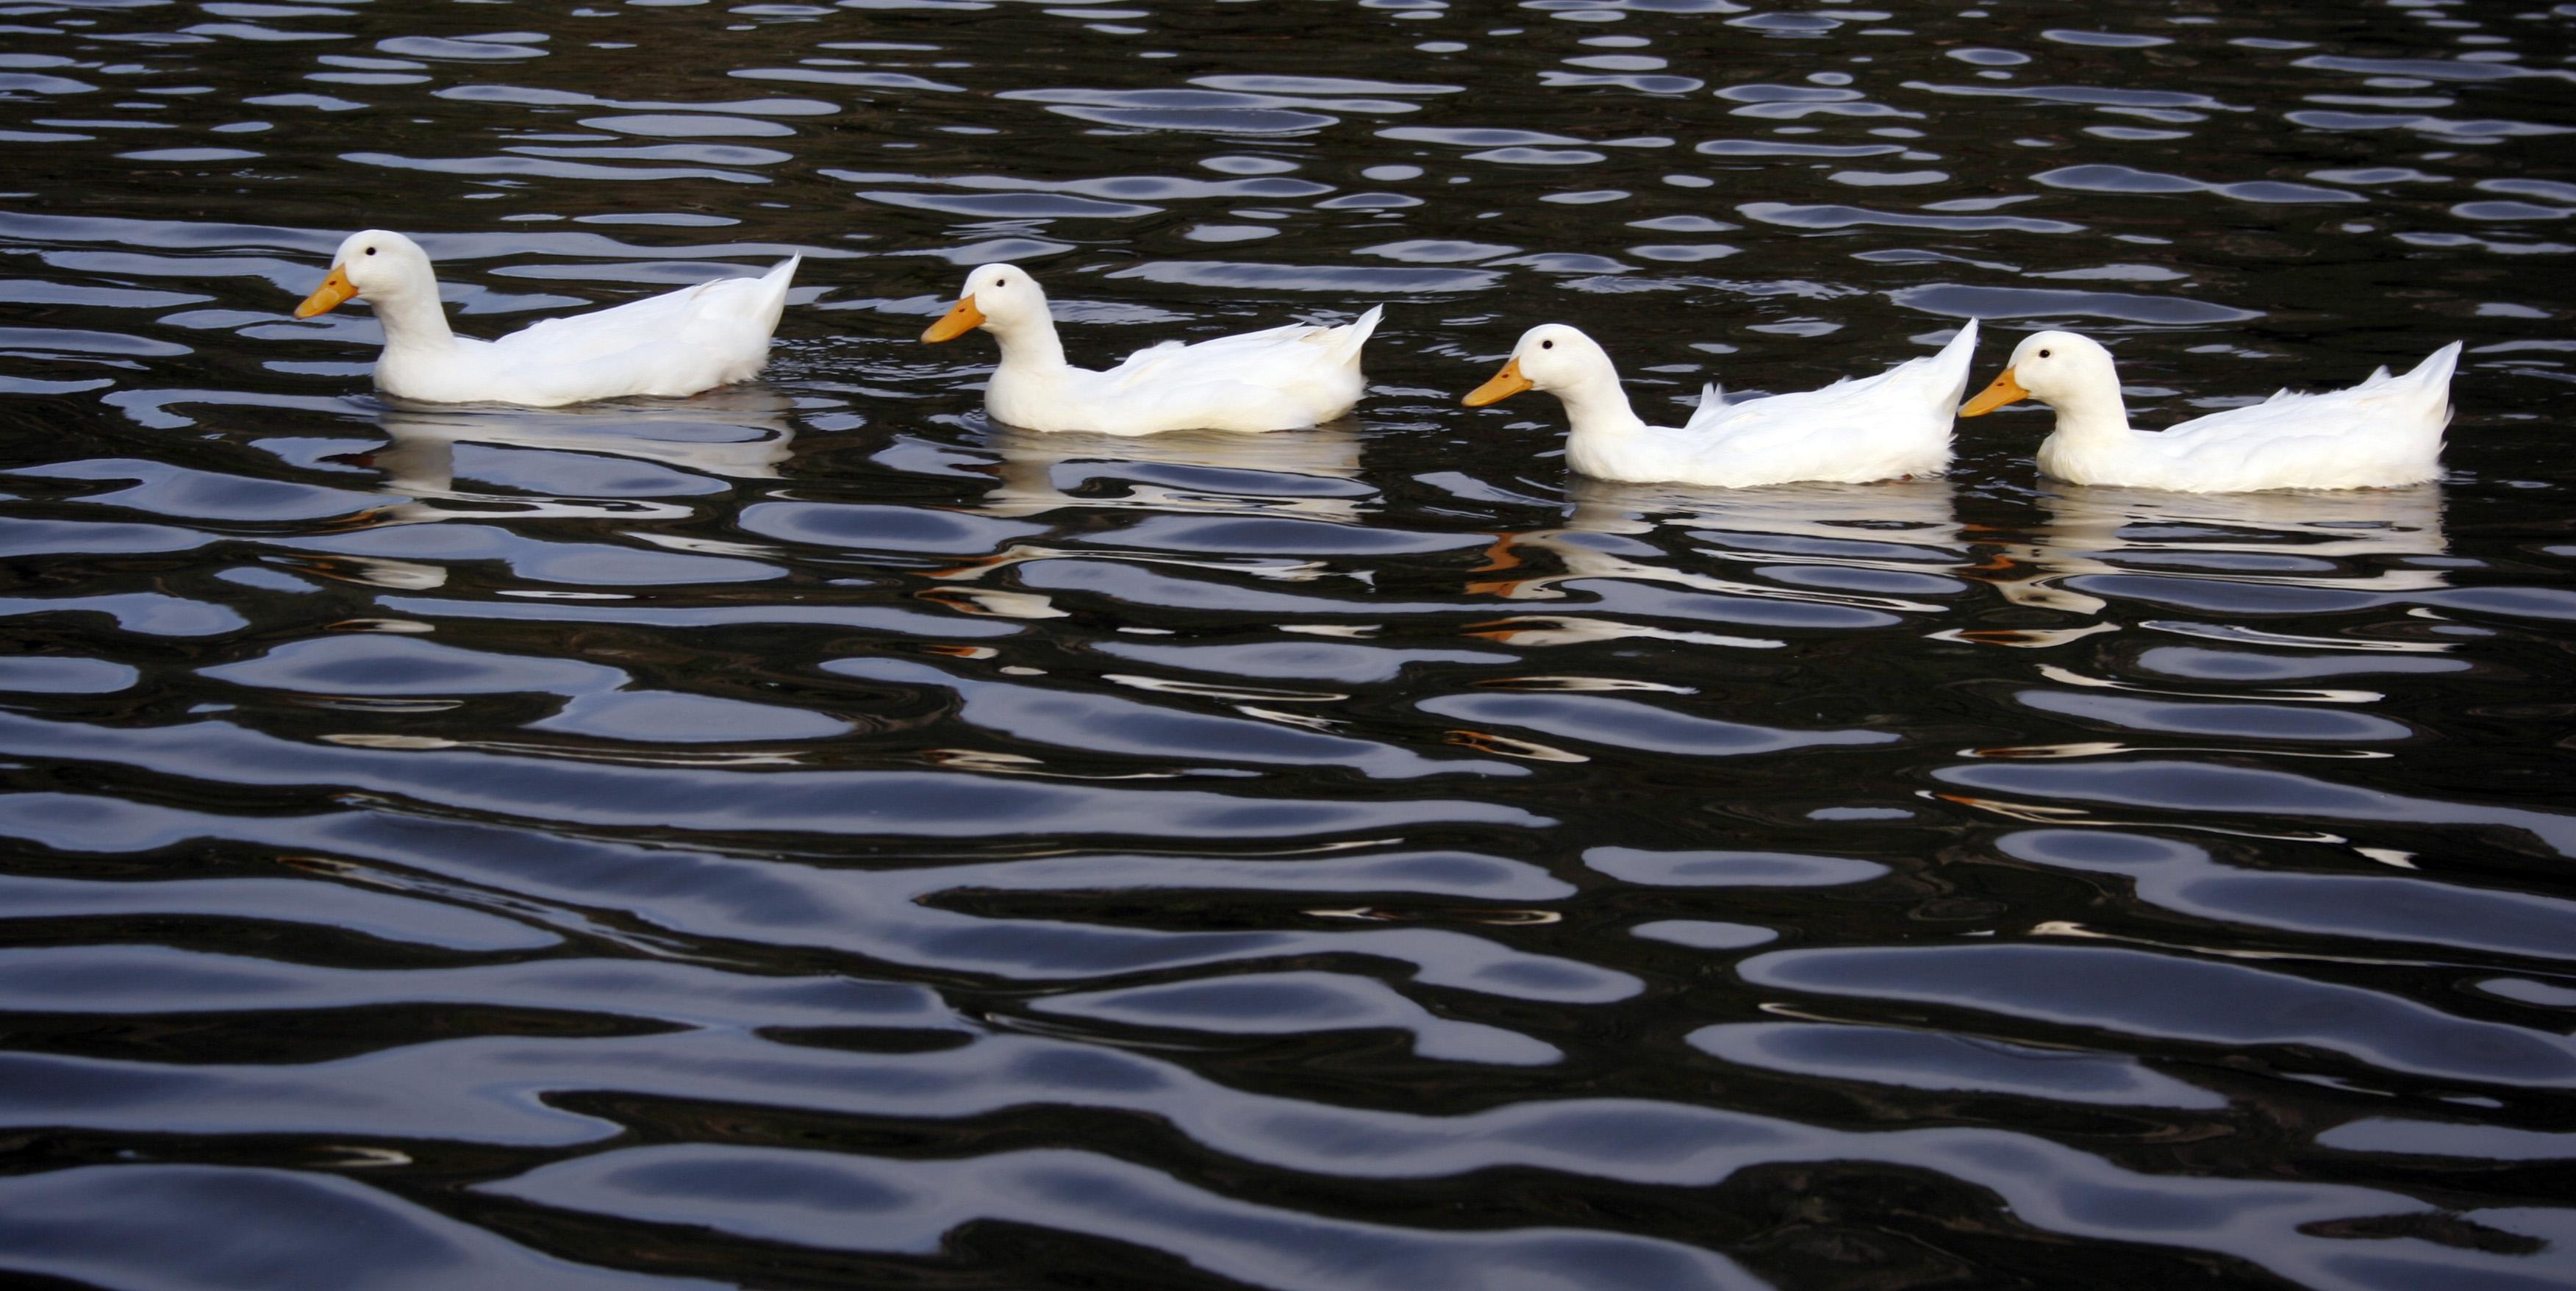 file ducks in a row jpg wikimedia commons